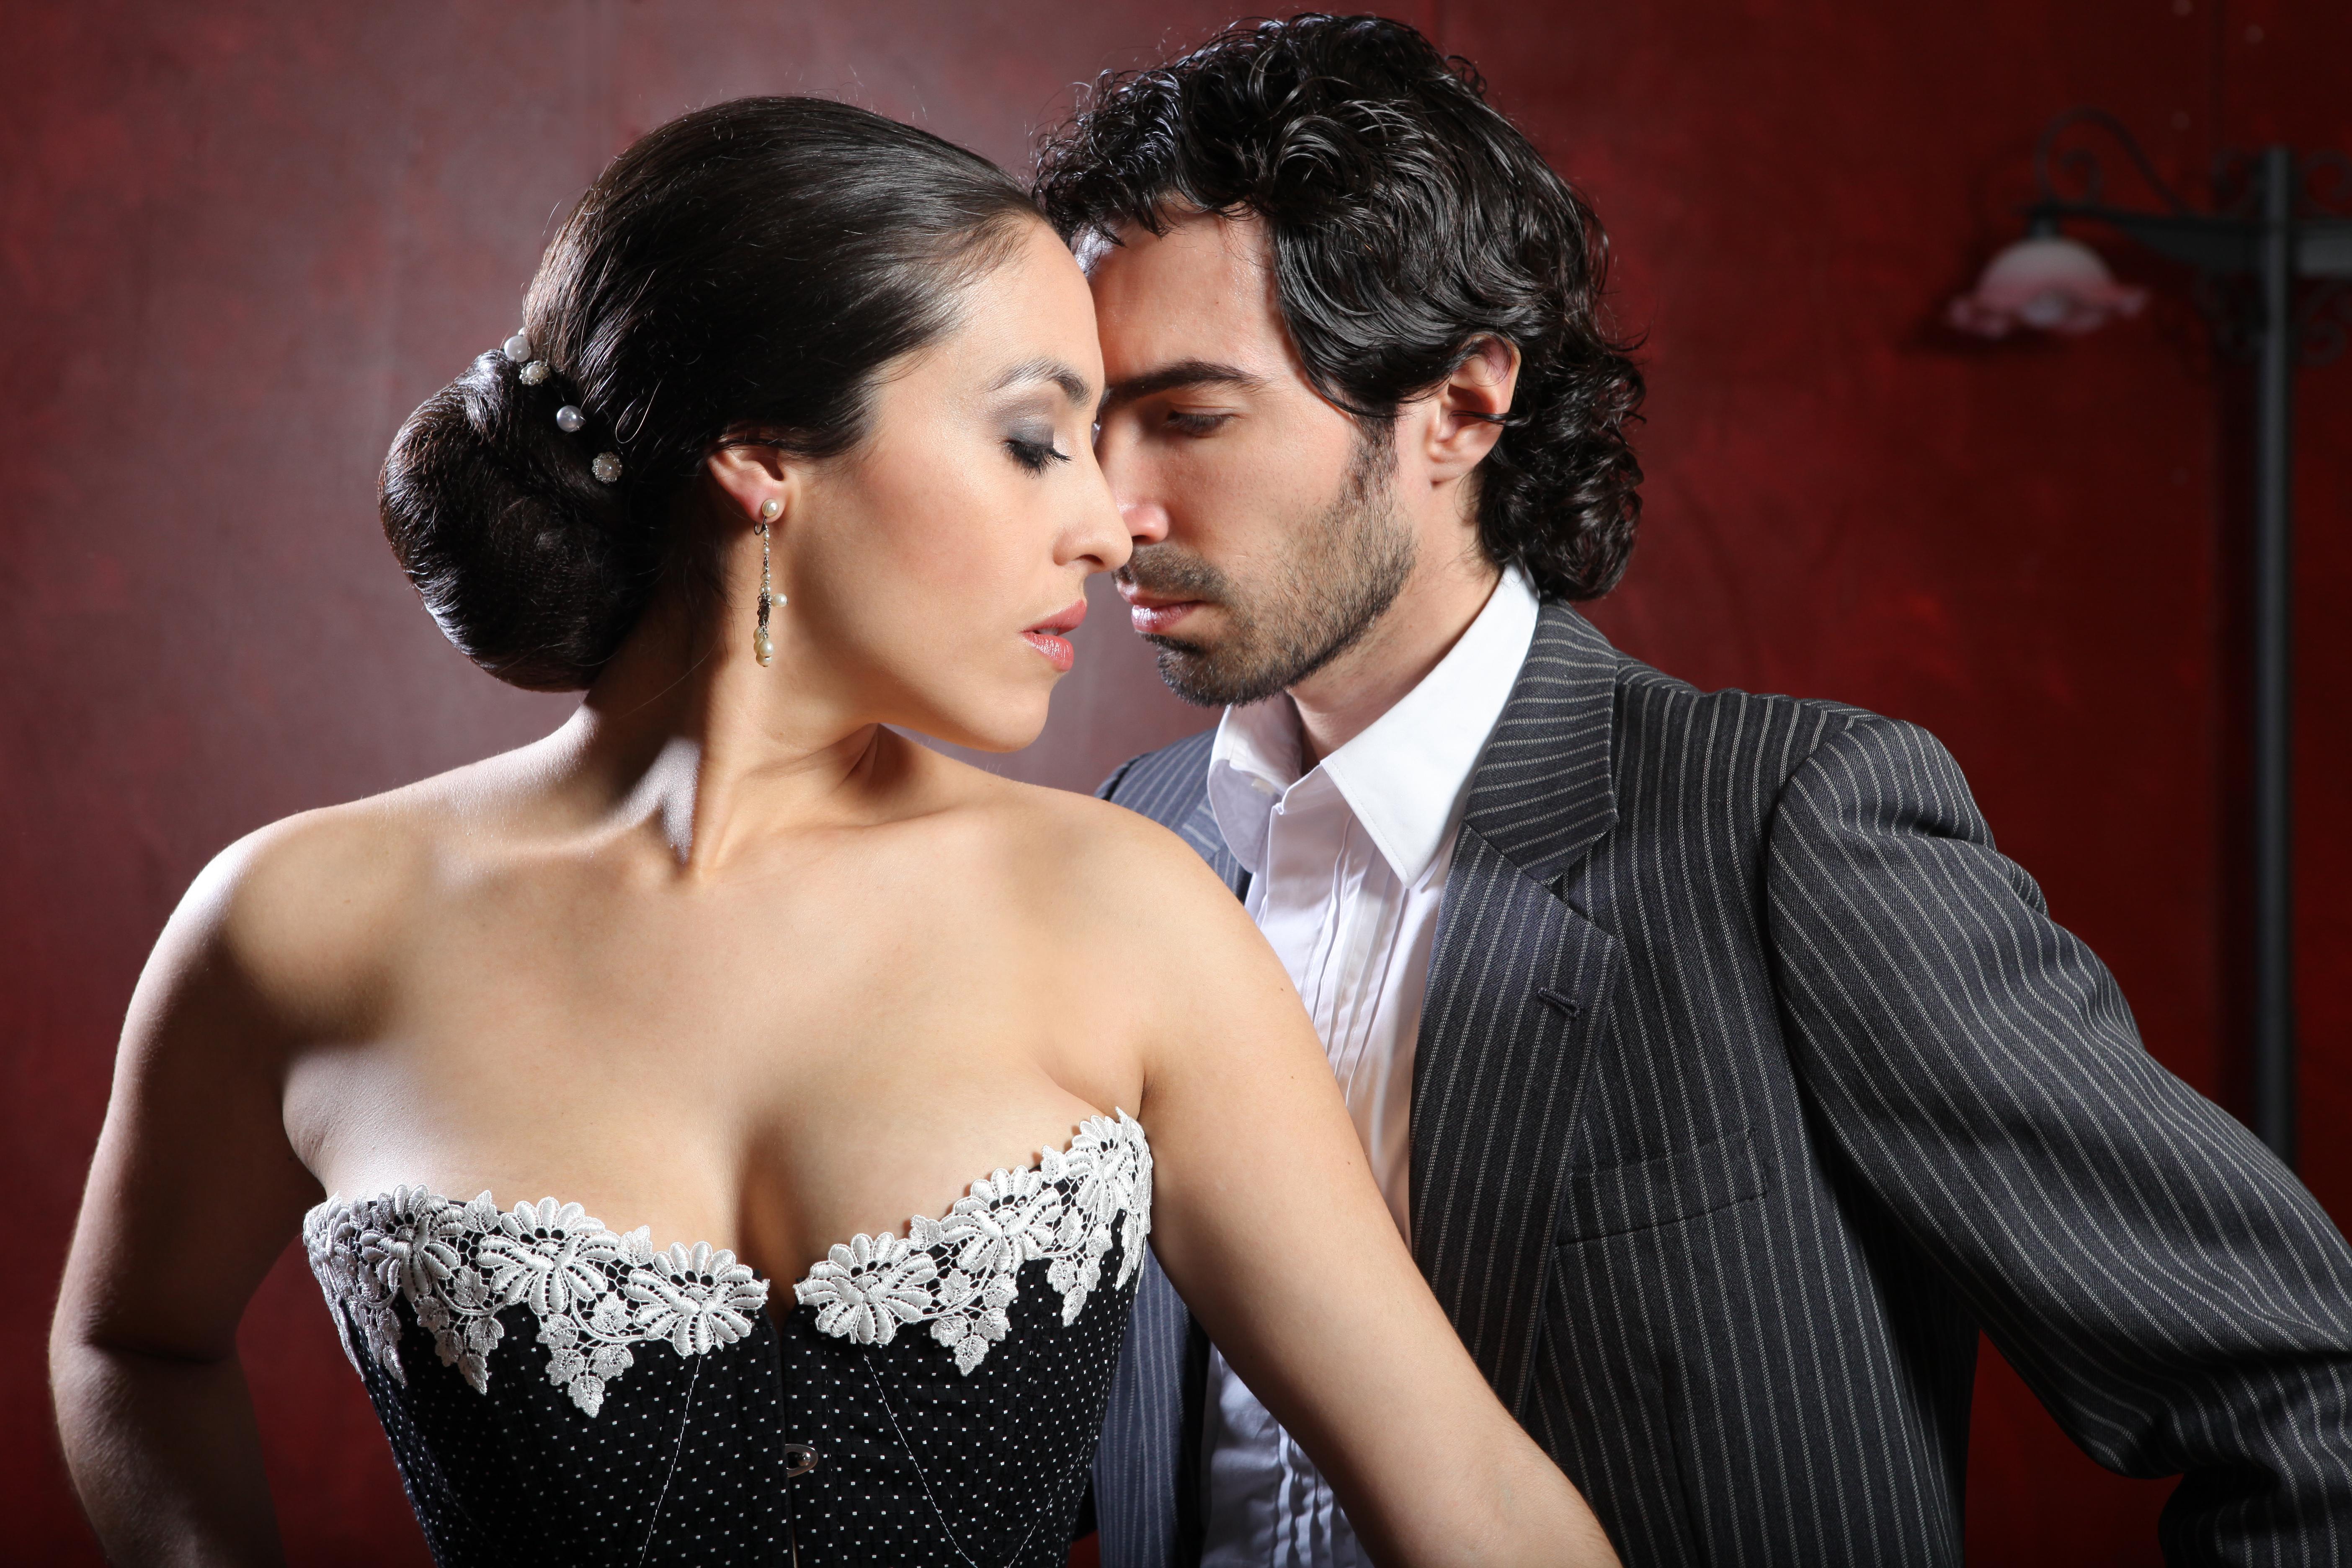 Tango Giorgio von Arb 2